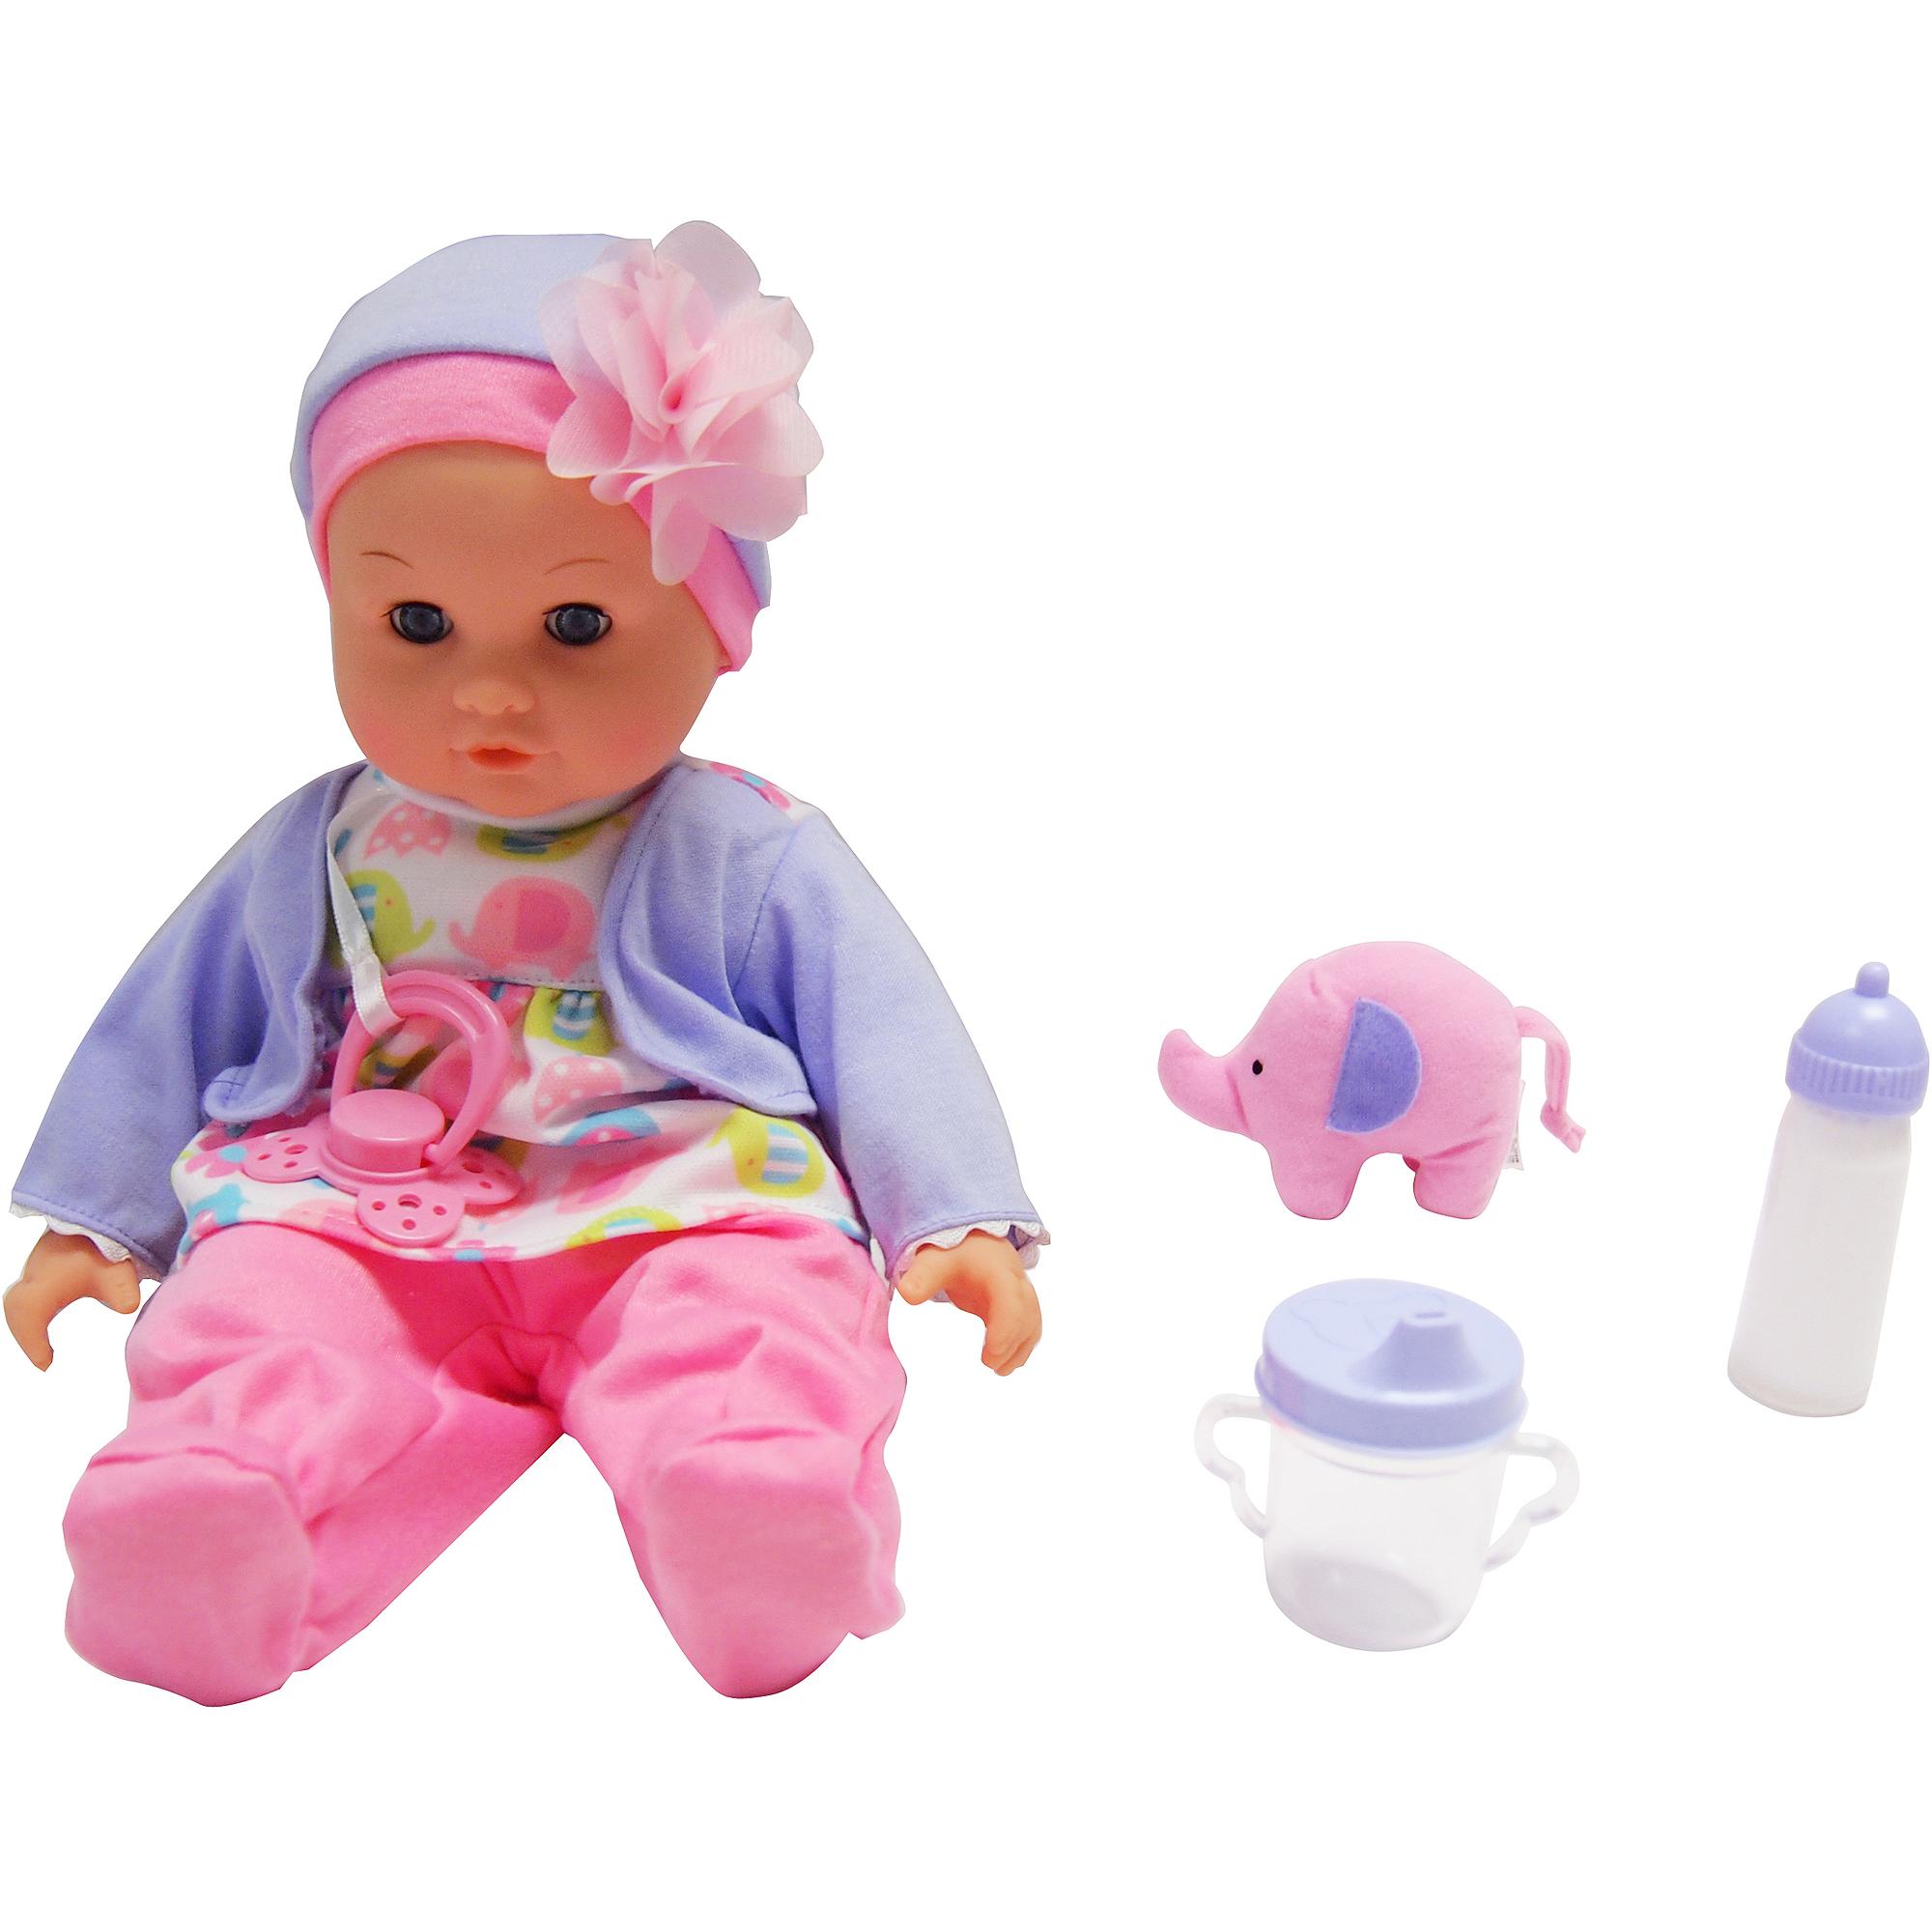 "My Sweet Love 14"" Baby Maggie Doll, Purple"